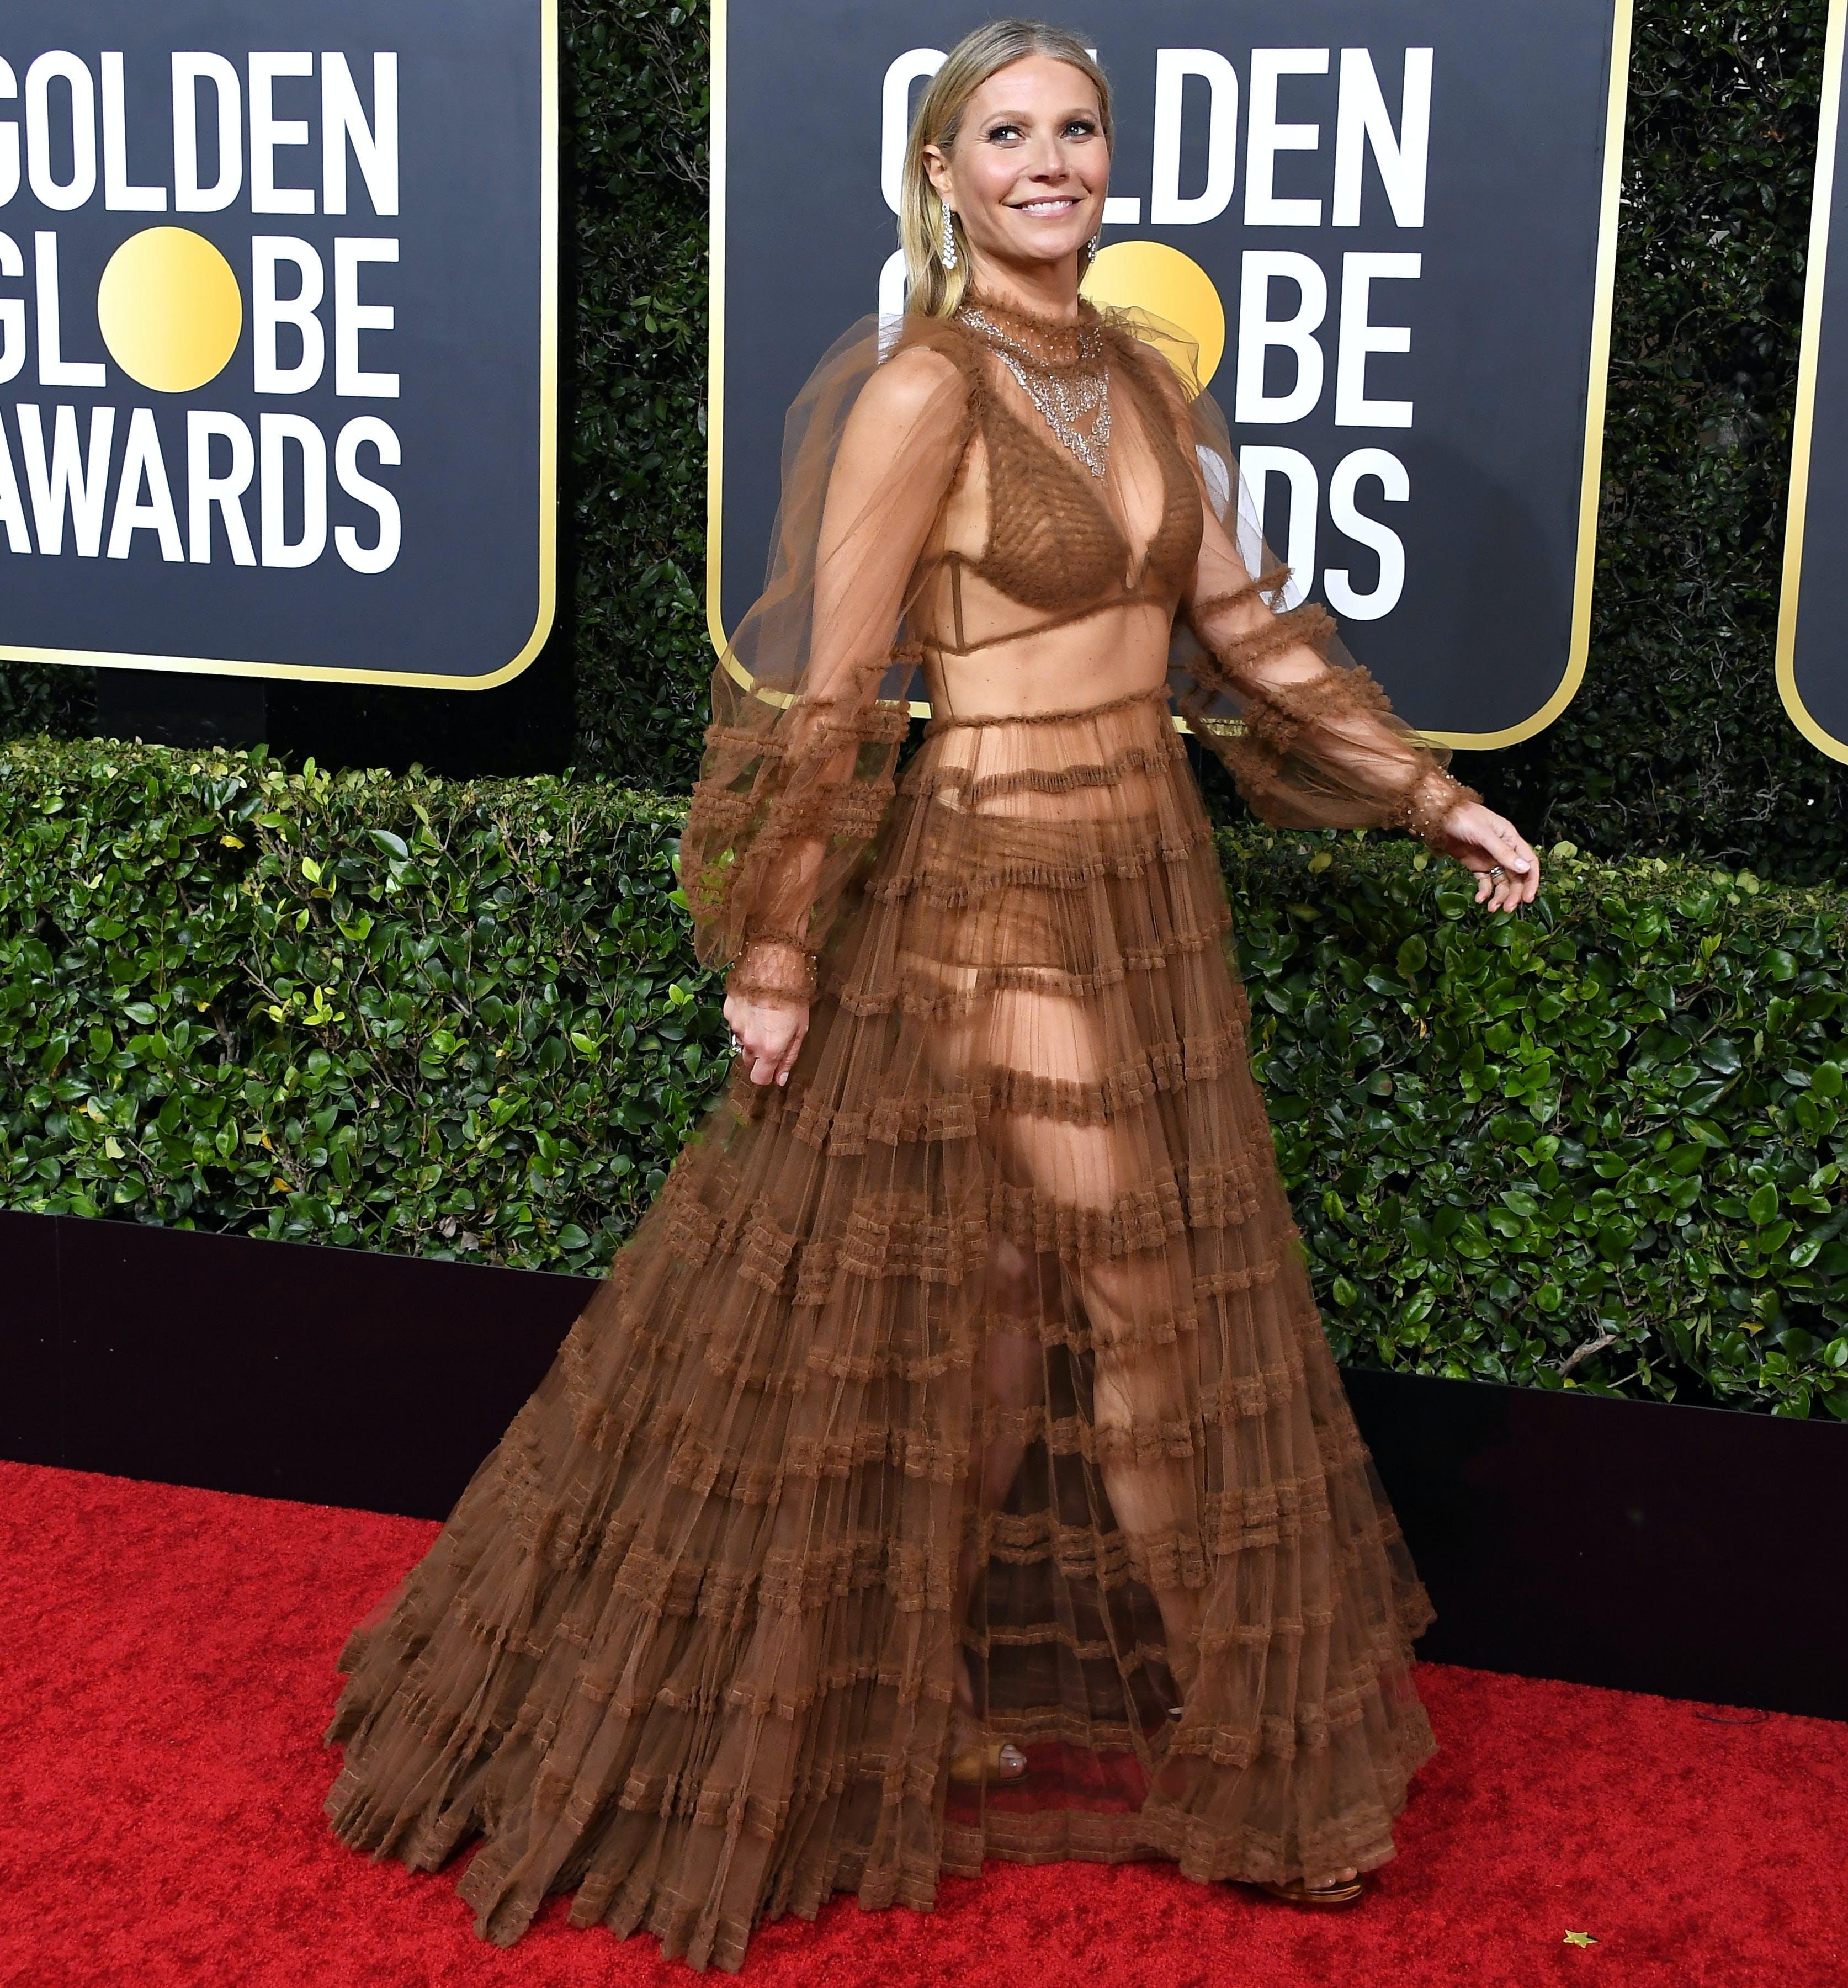 gwyneth paltrow wearing fendi at the golden globes